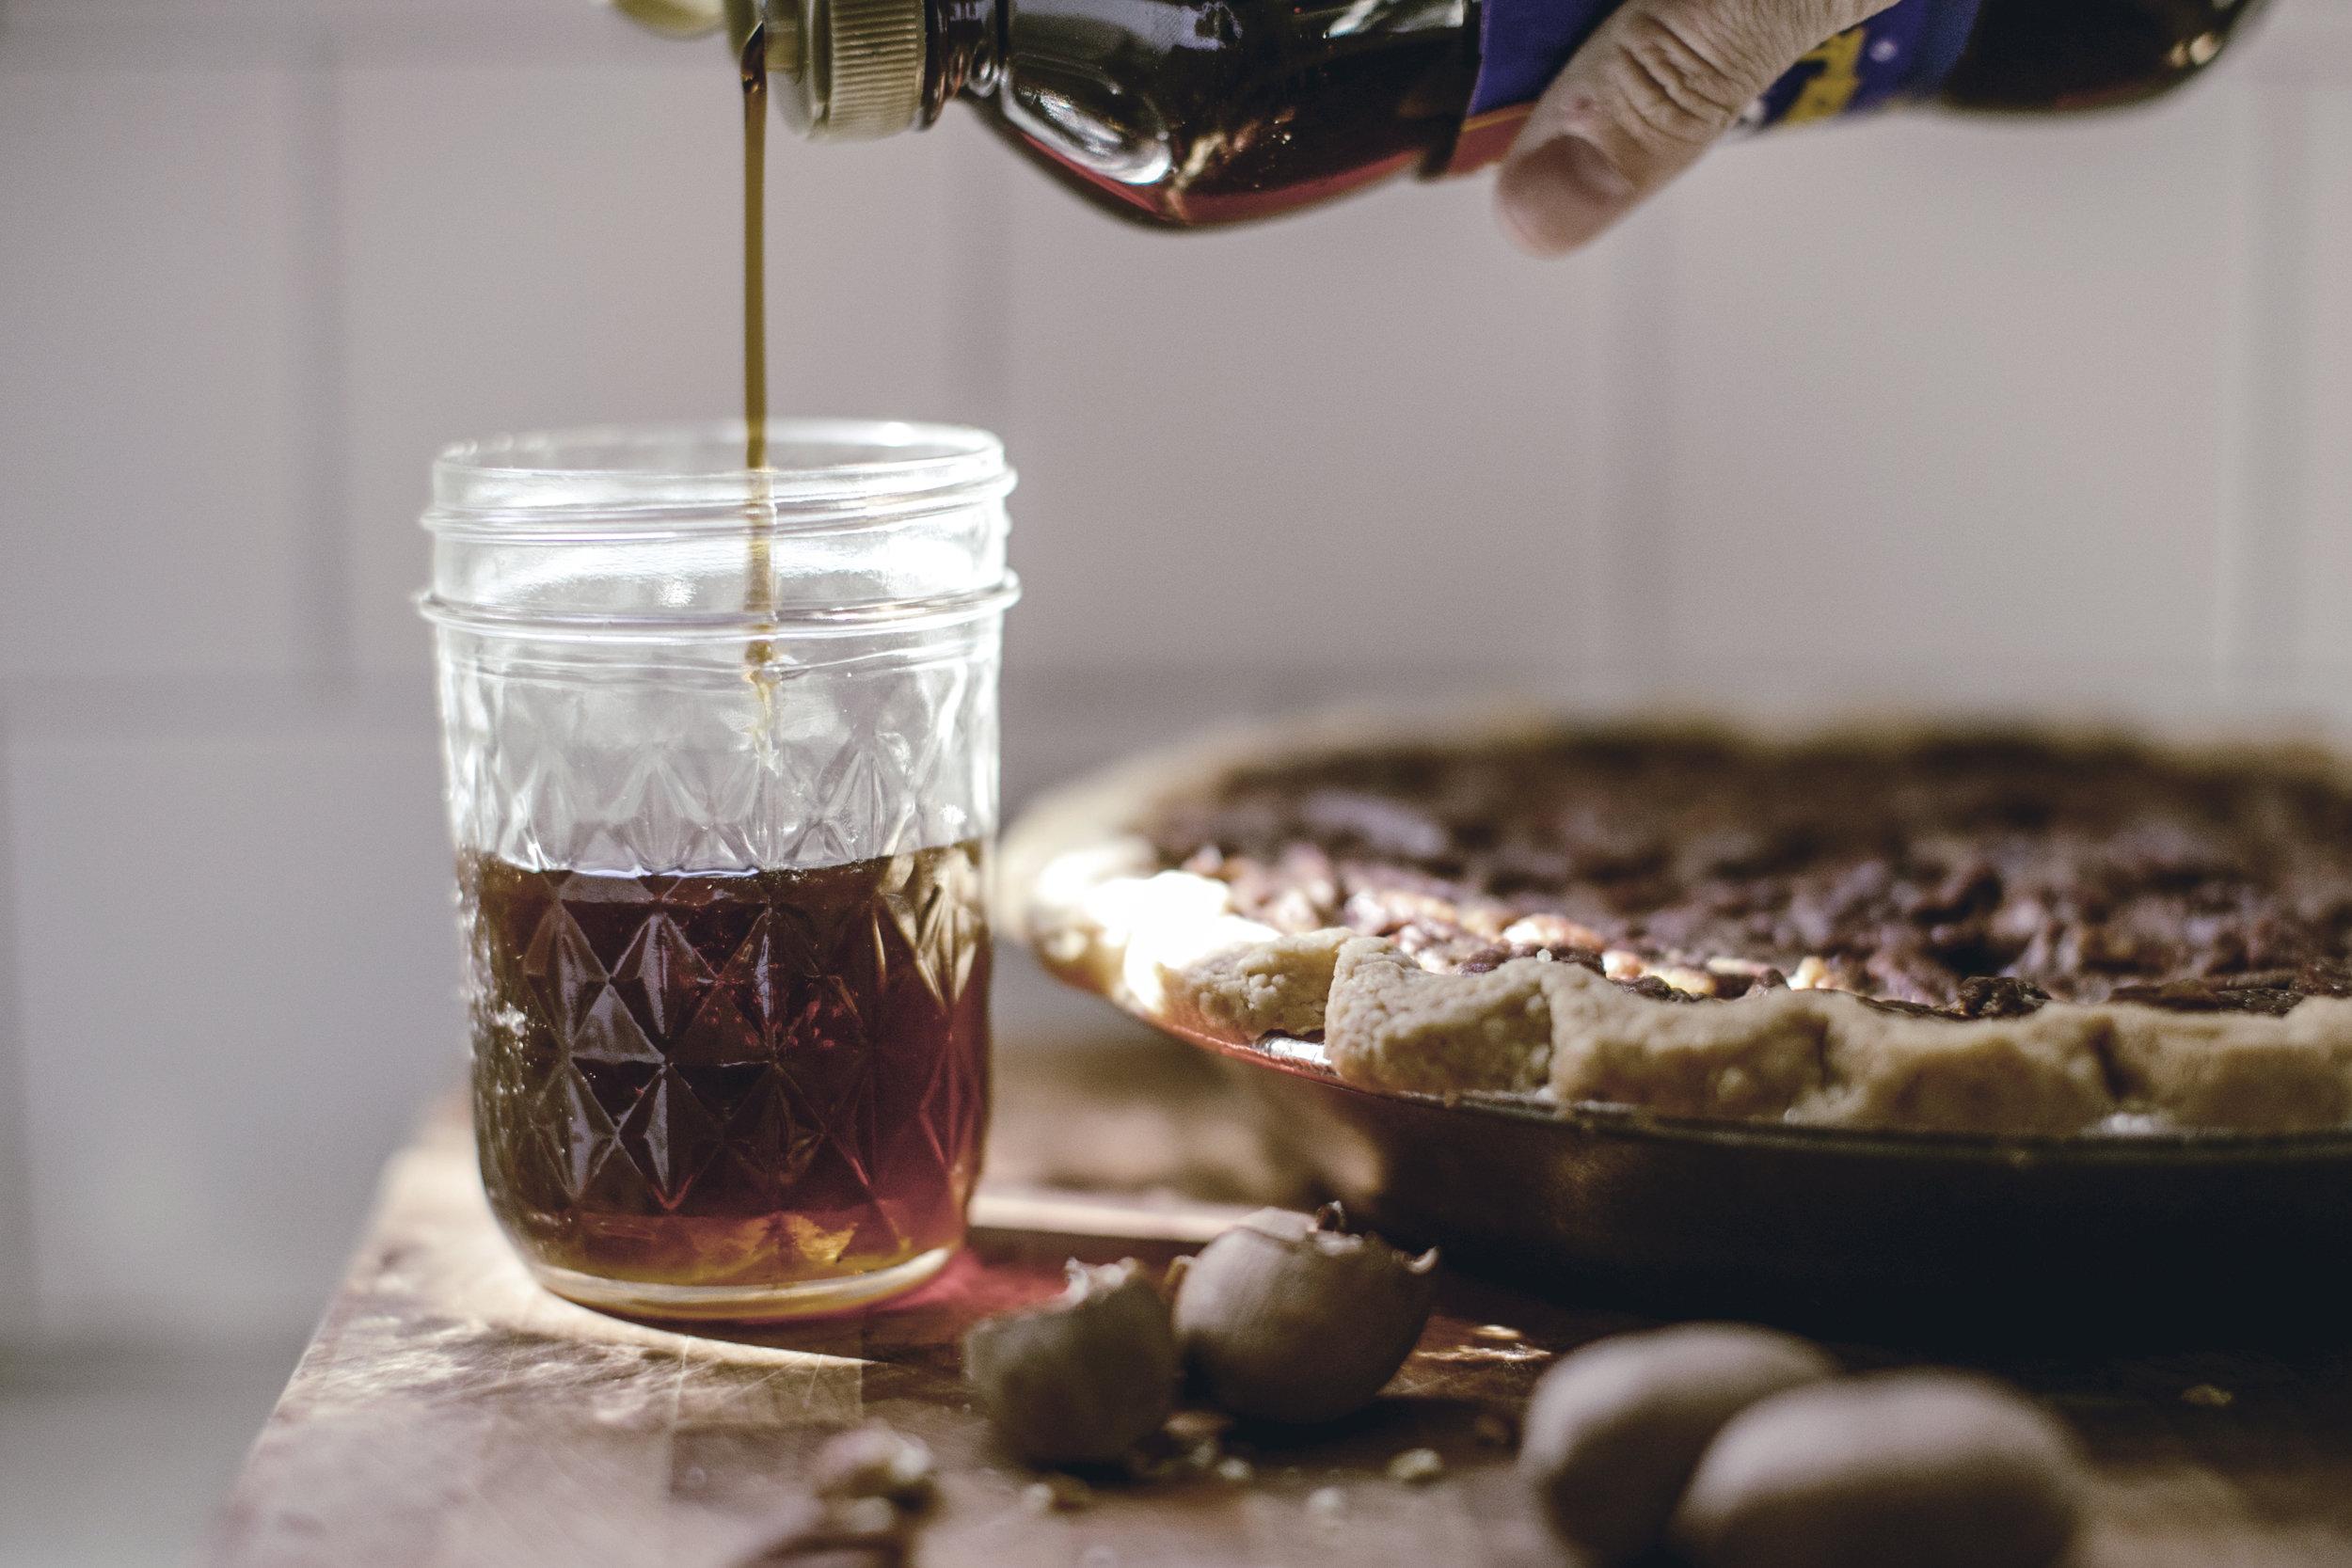 karo syrup for pecan pie